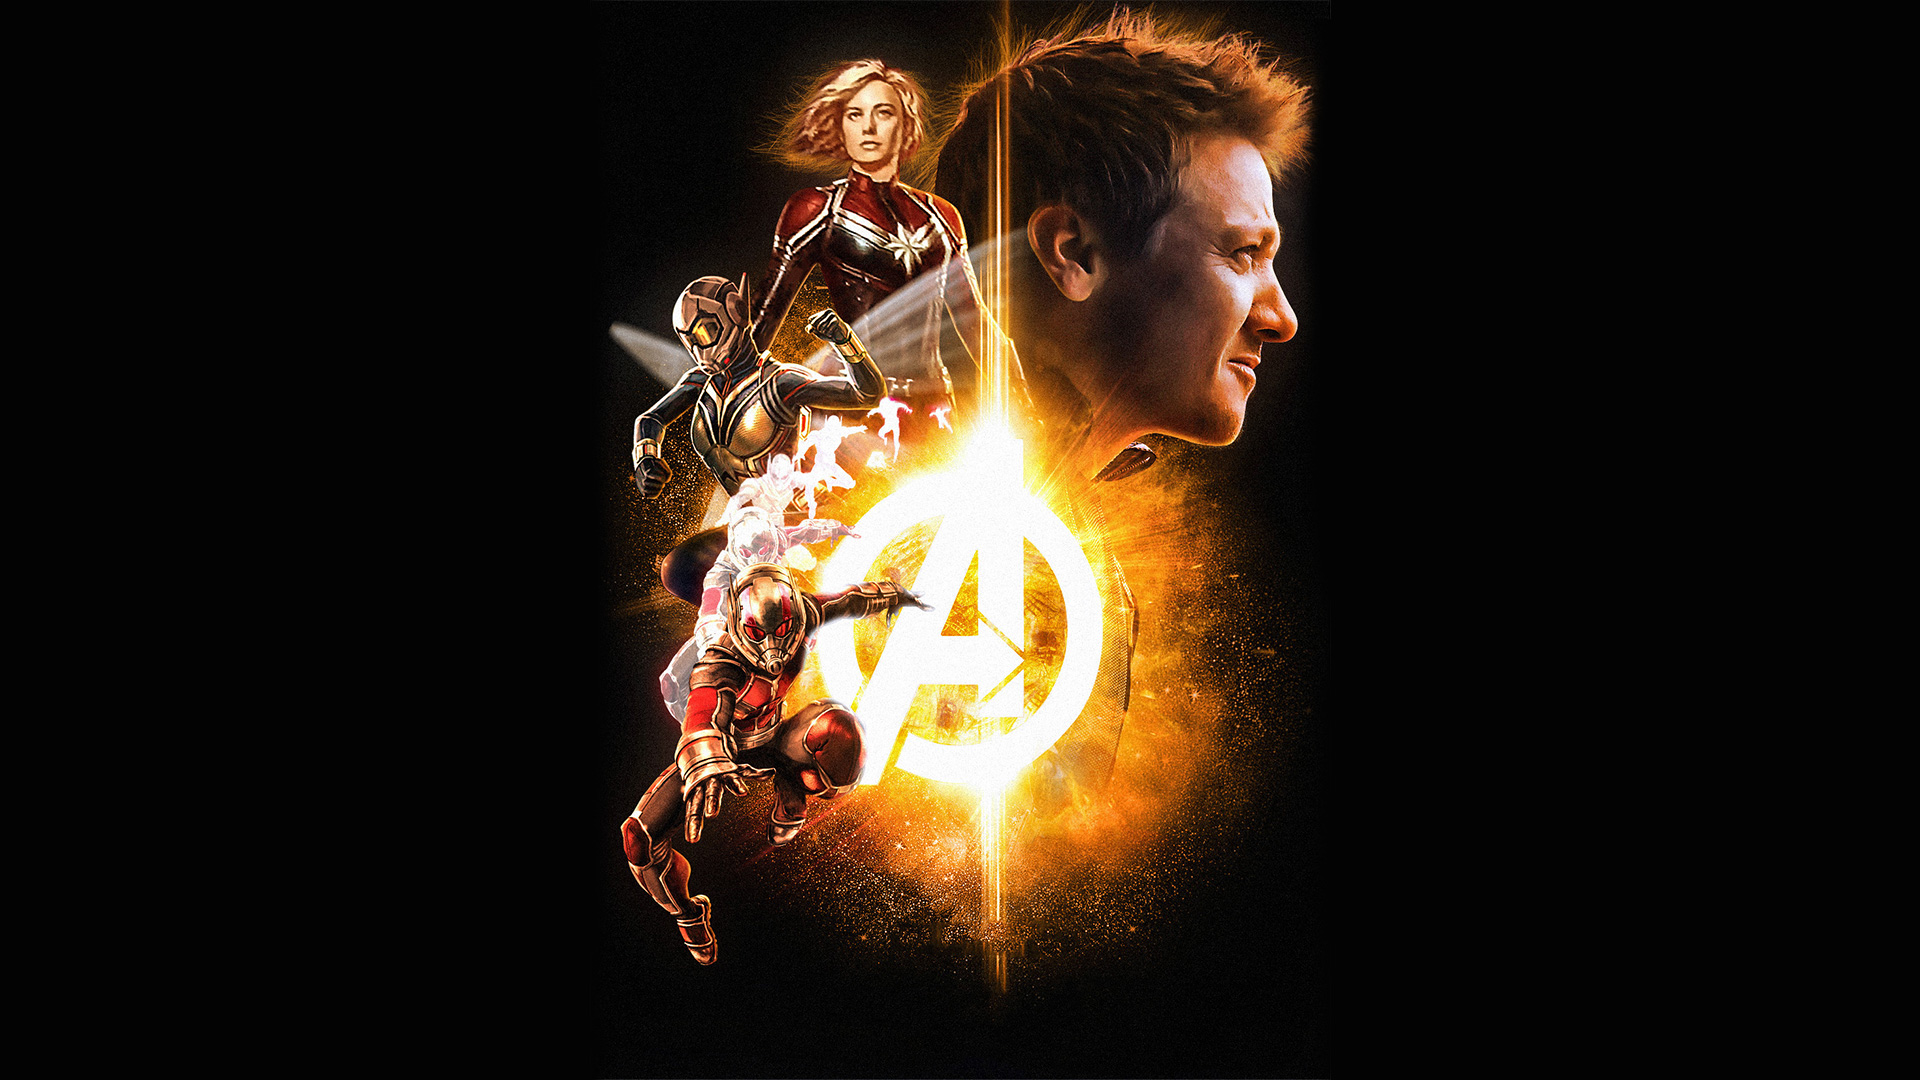 Wallpaper 4k Avengers Infinity War Hawkeye Wasp Captain Marvel Ant